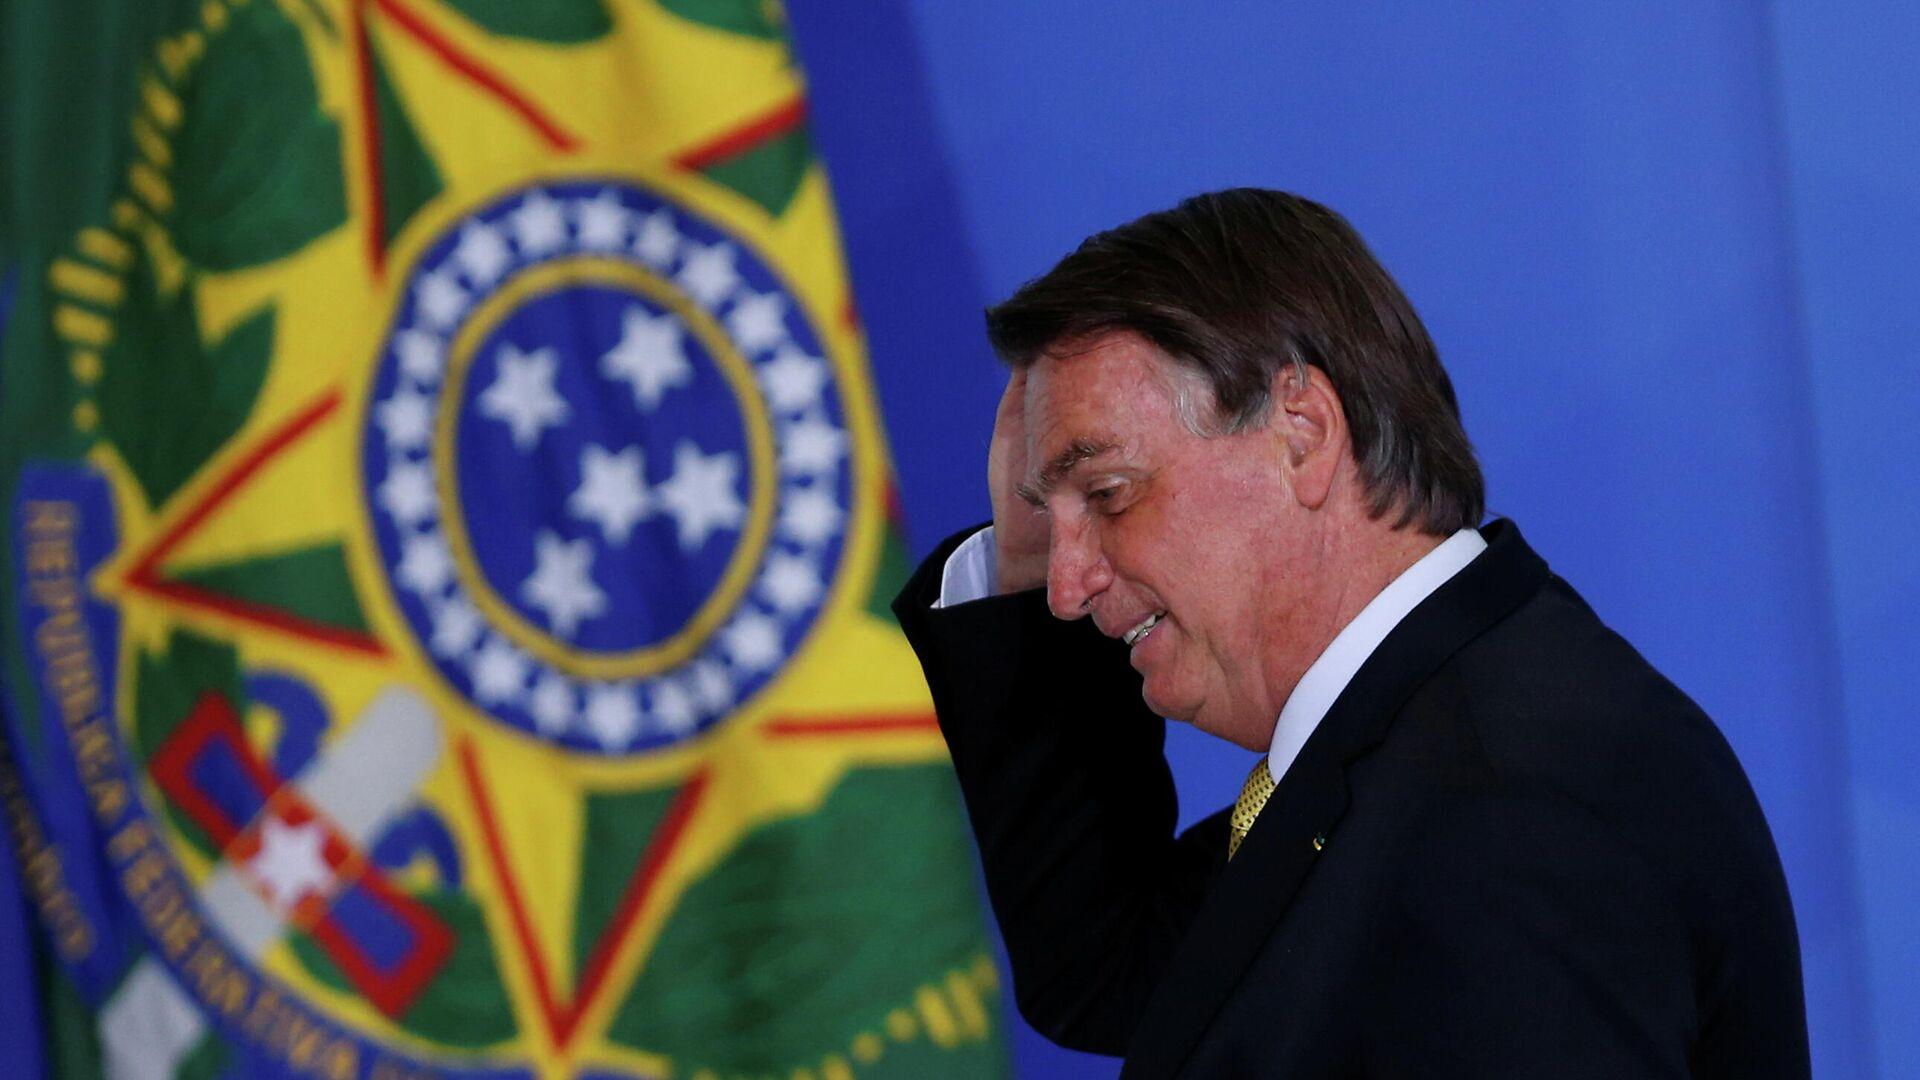 Jair Bolsonaro, presidente de Brasil - Sputnik Mundo, 1920, 07.07.2021